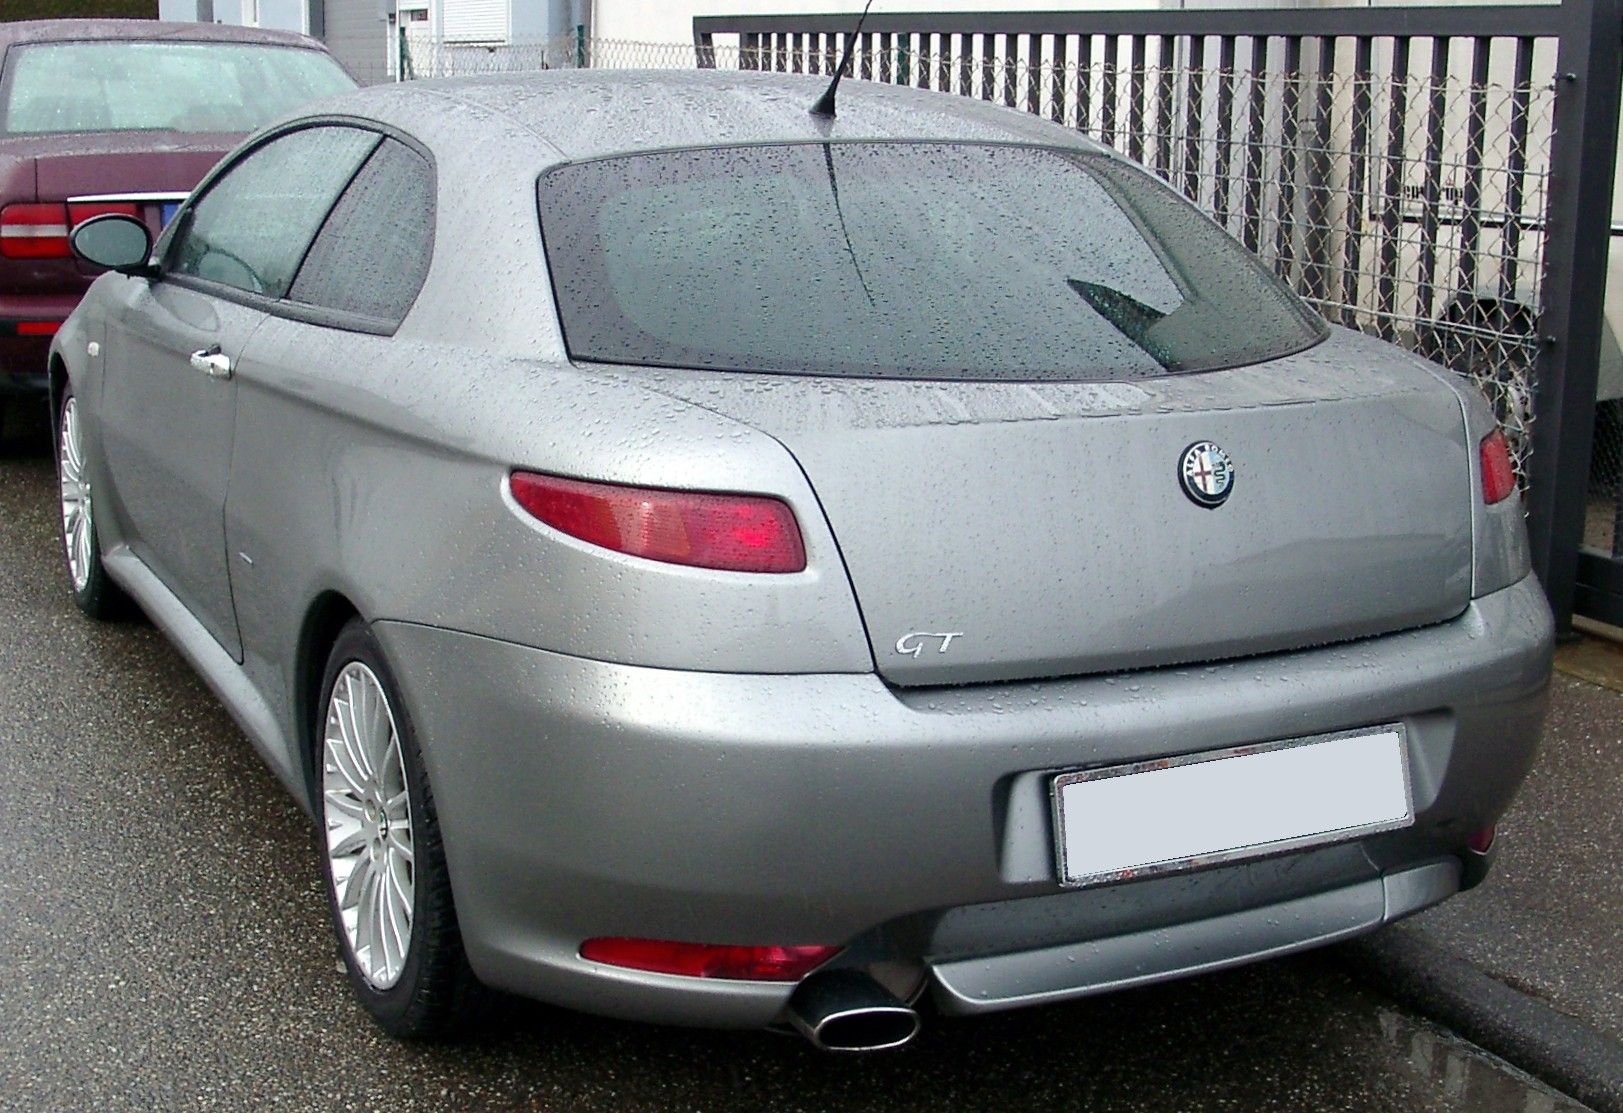 File:Alfa Romeo GT rear 20080419.jpg - Wikiquote